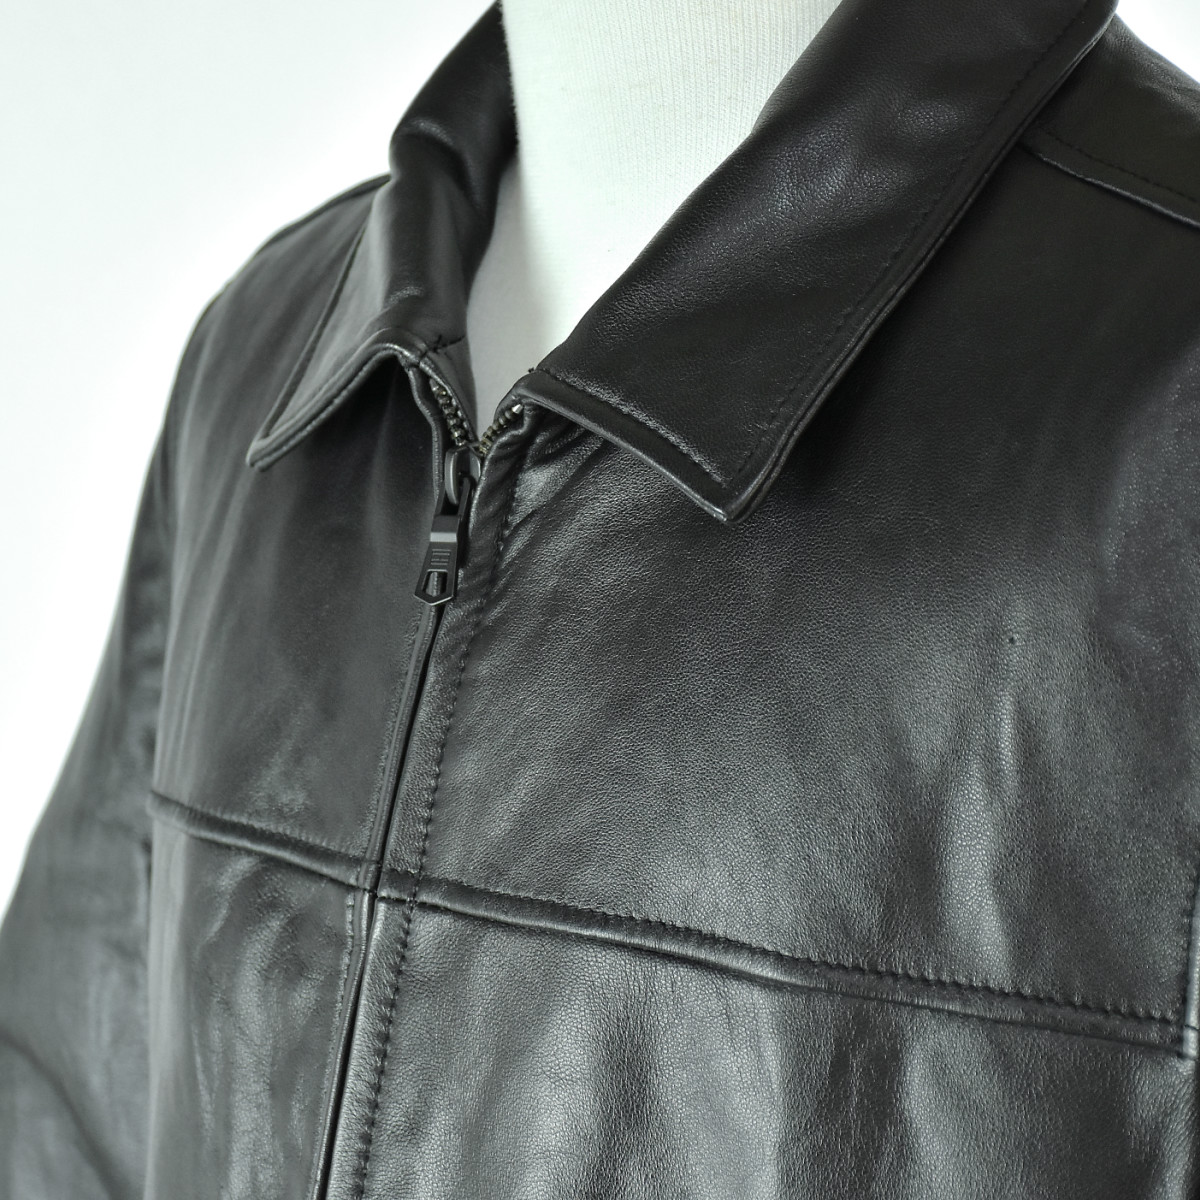 Tommy Hilfiger Mensトミーフィルフィガー・メンズGENUINE Leather(本革)ジャケット